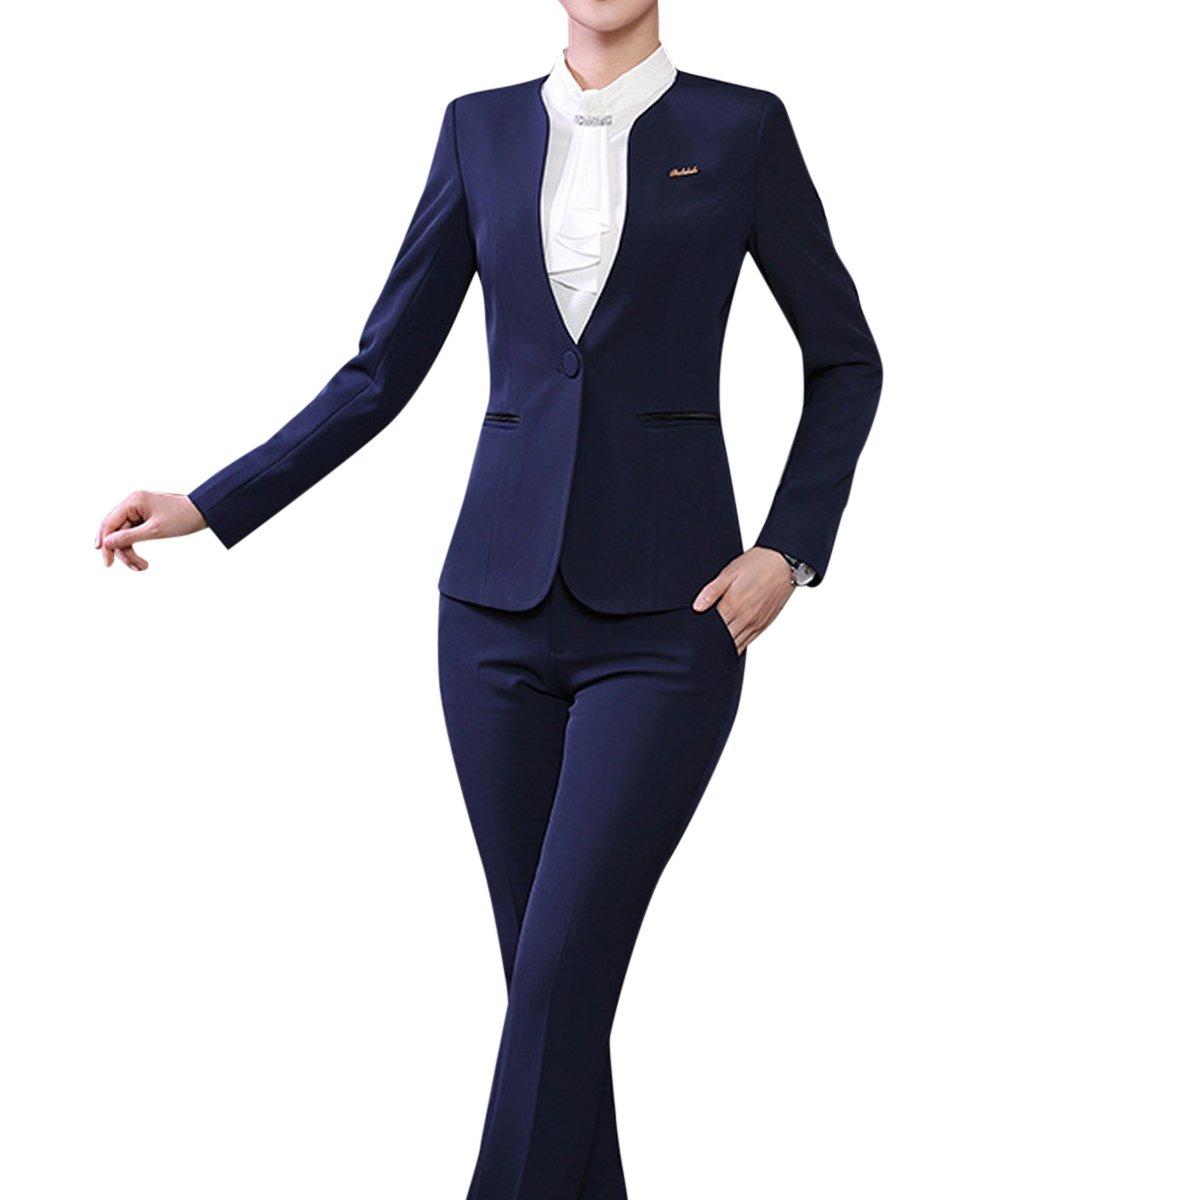 Women's 2 Piece Office Lady Business Suit Set Slim Fit Blazer Pant by YUNCLOS